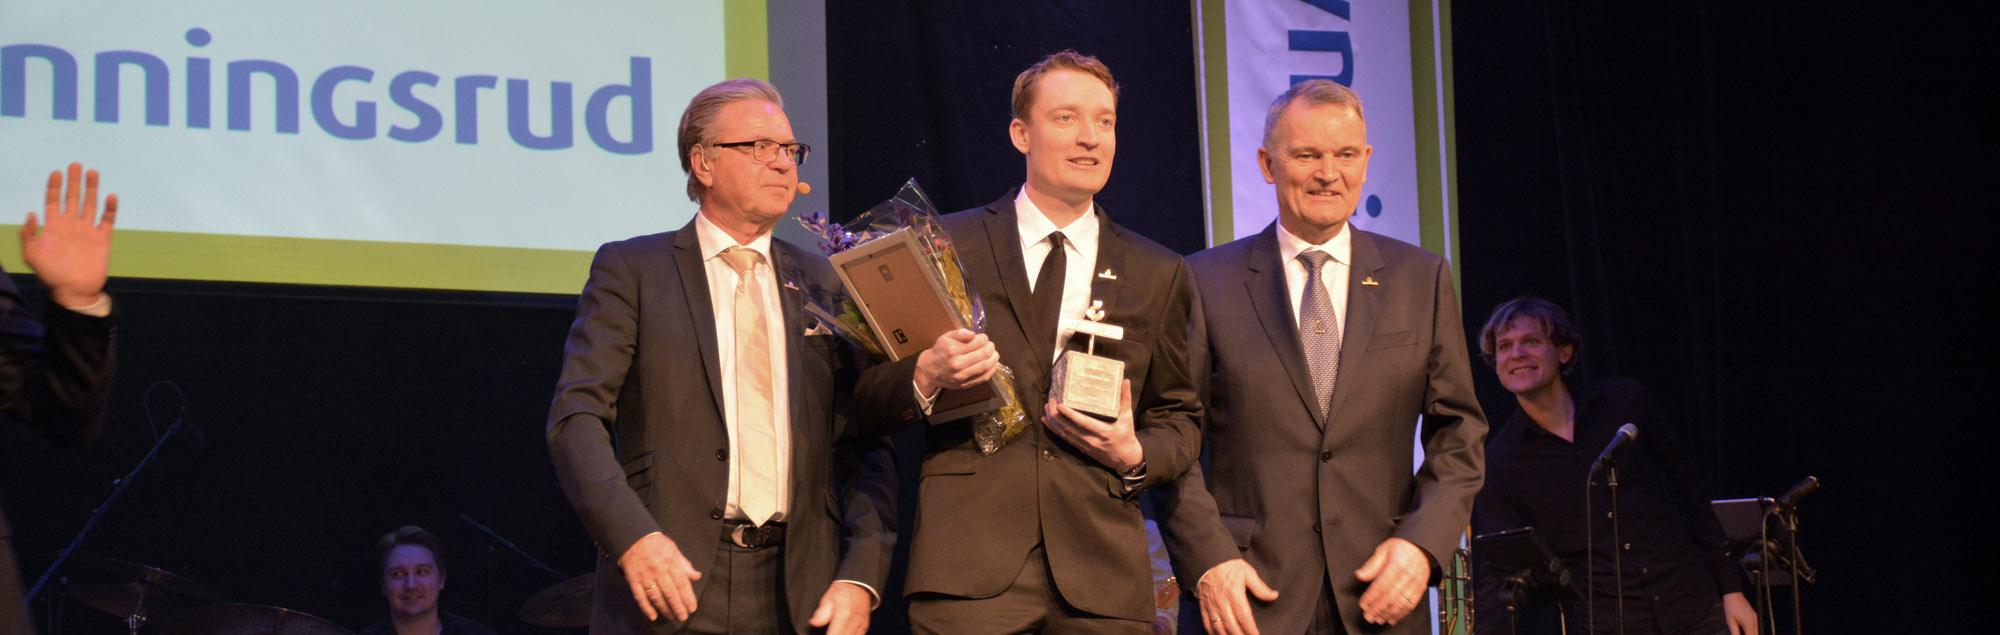 HMS-priset Prefab 2019 till Daniel Philipps